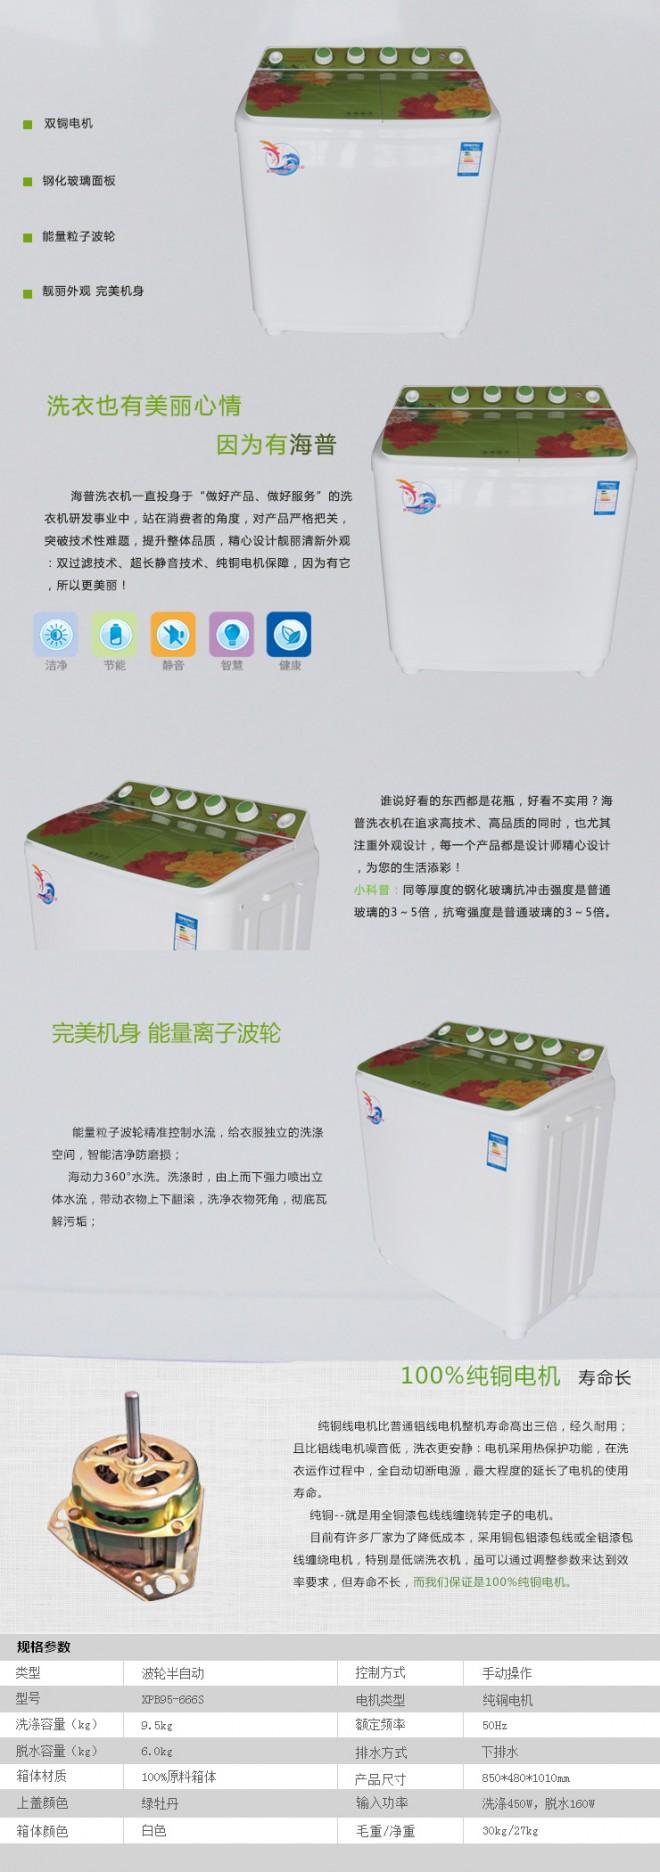 XPB95-666S(绿牡丹) XPB95-666S(绿牡丹)-产品中心-海普洗衣机